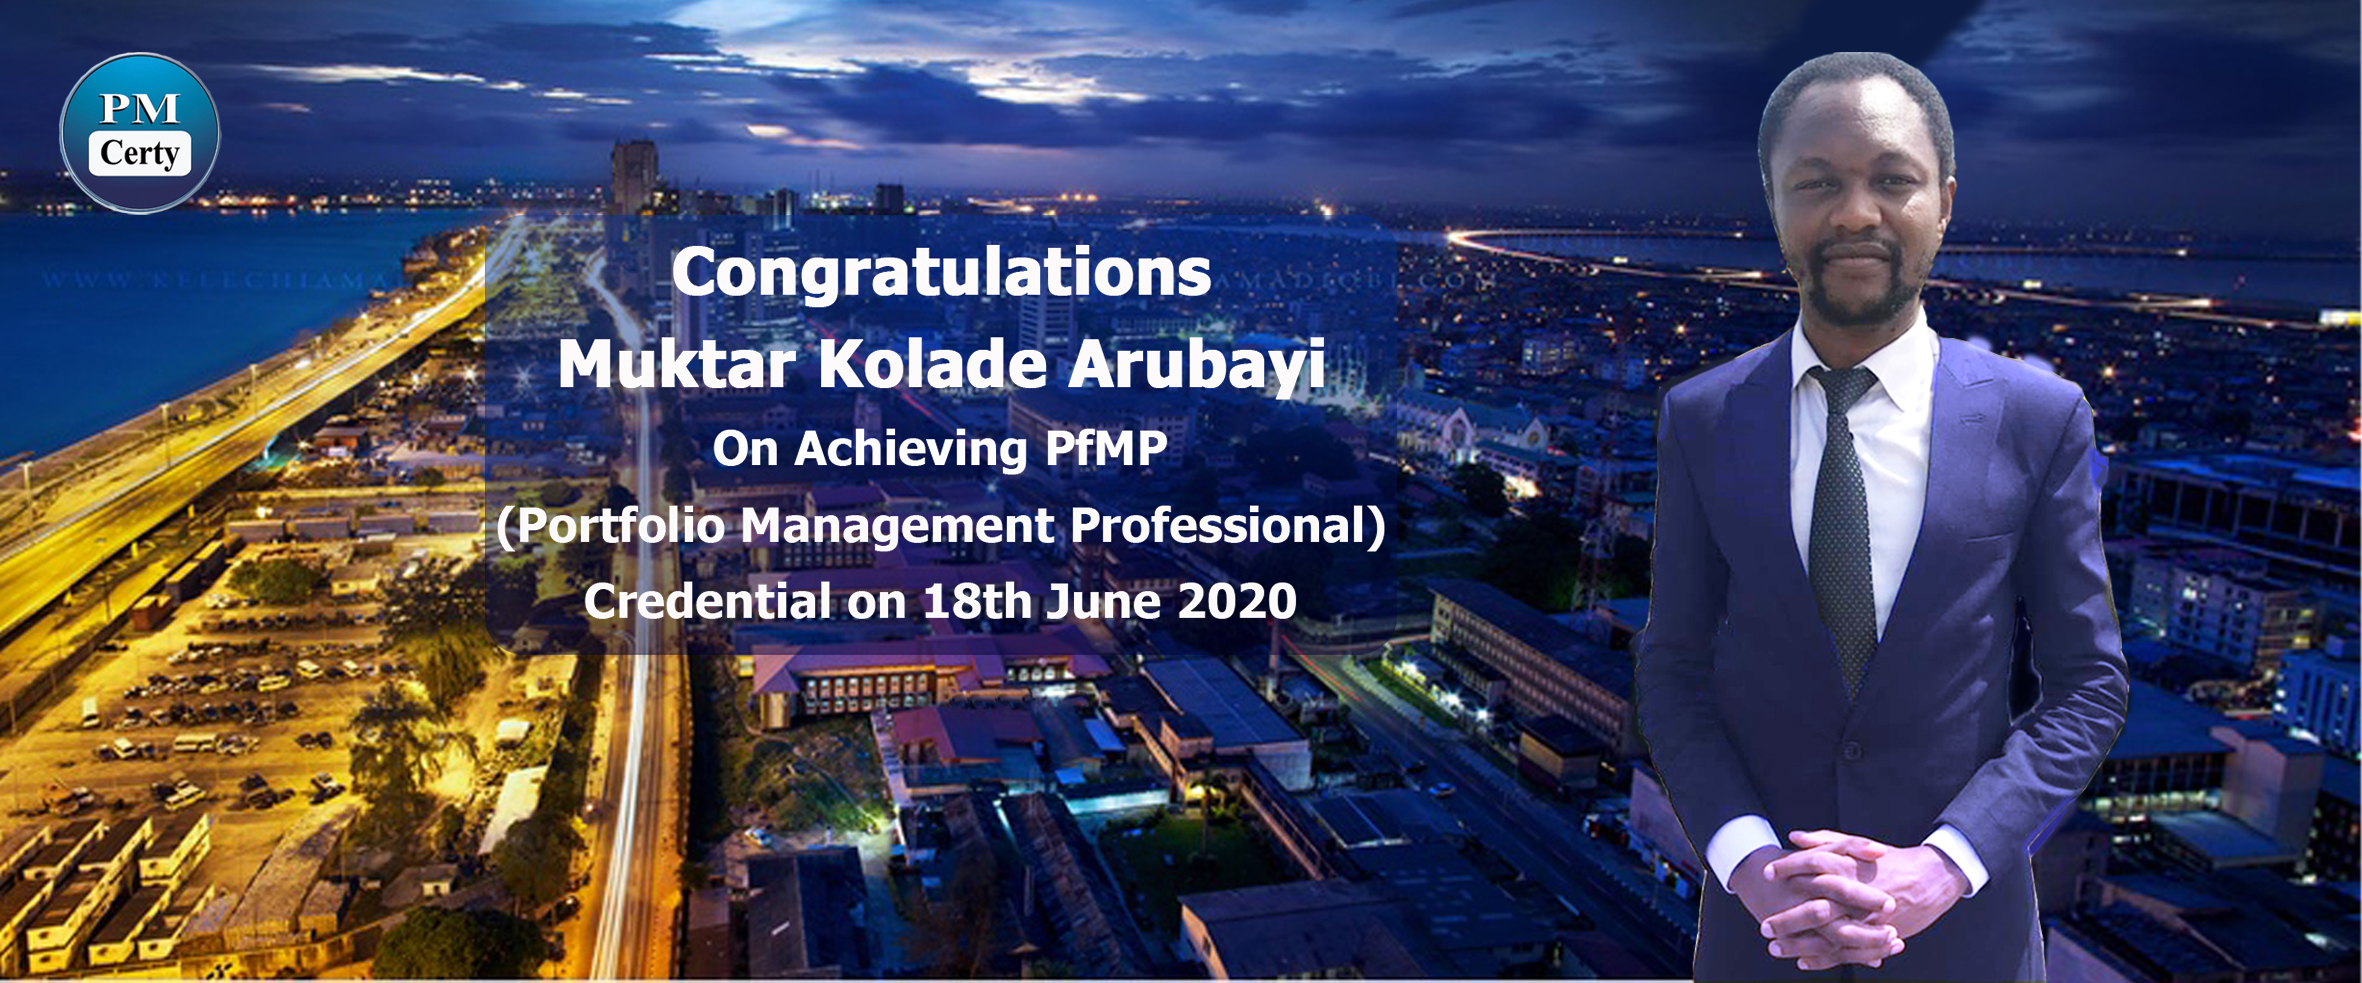 Congratulations Muktar on Achieving PfMP..!